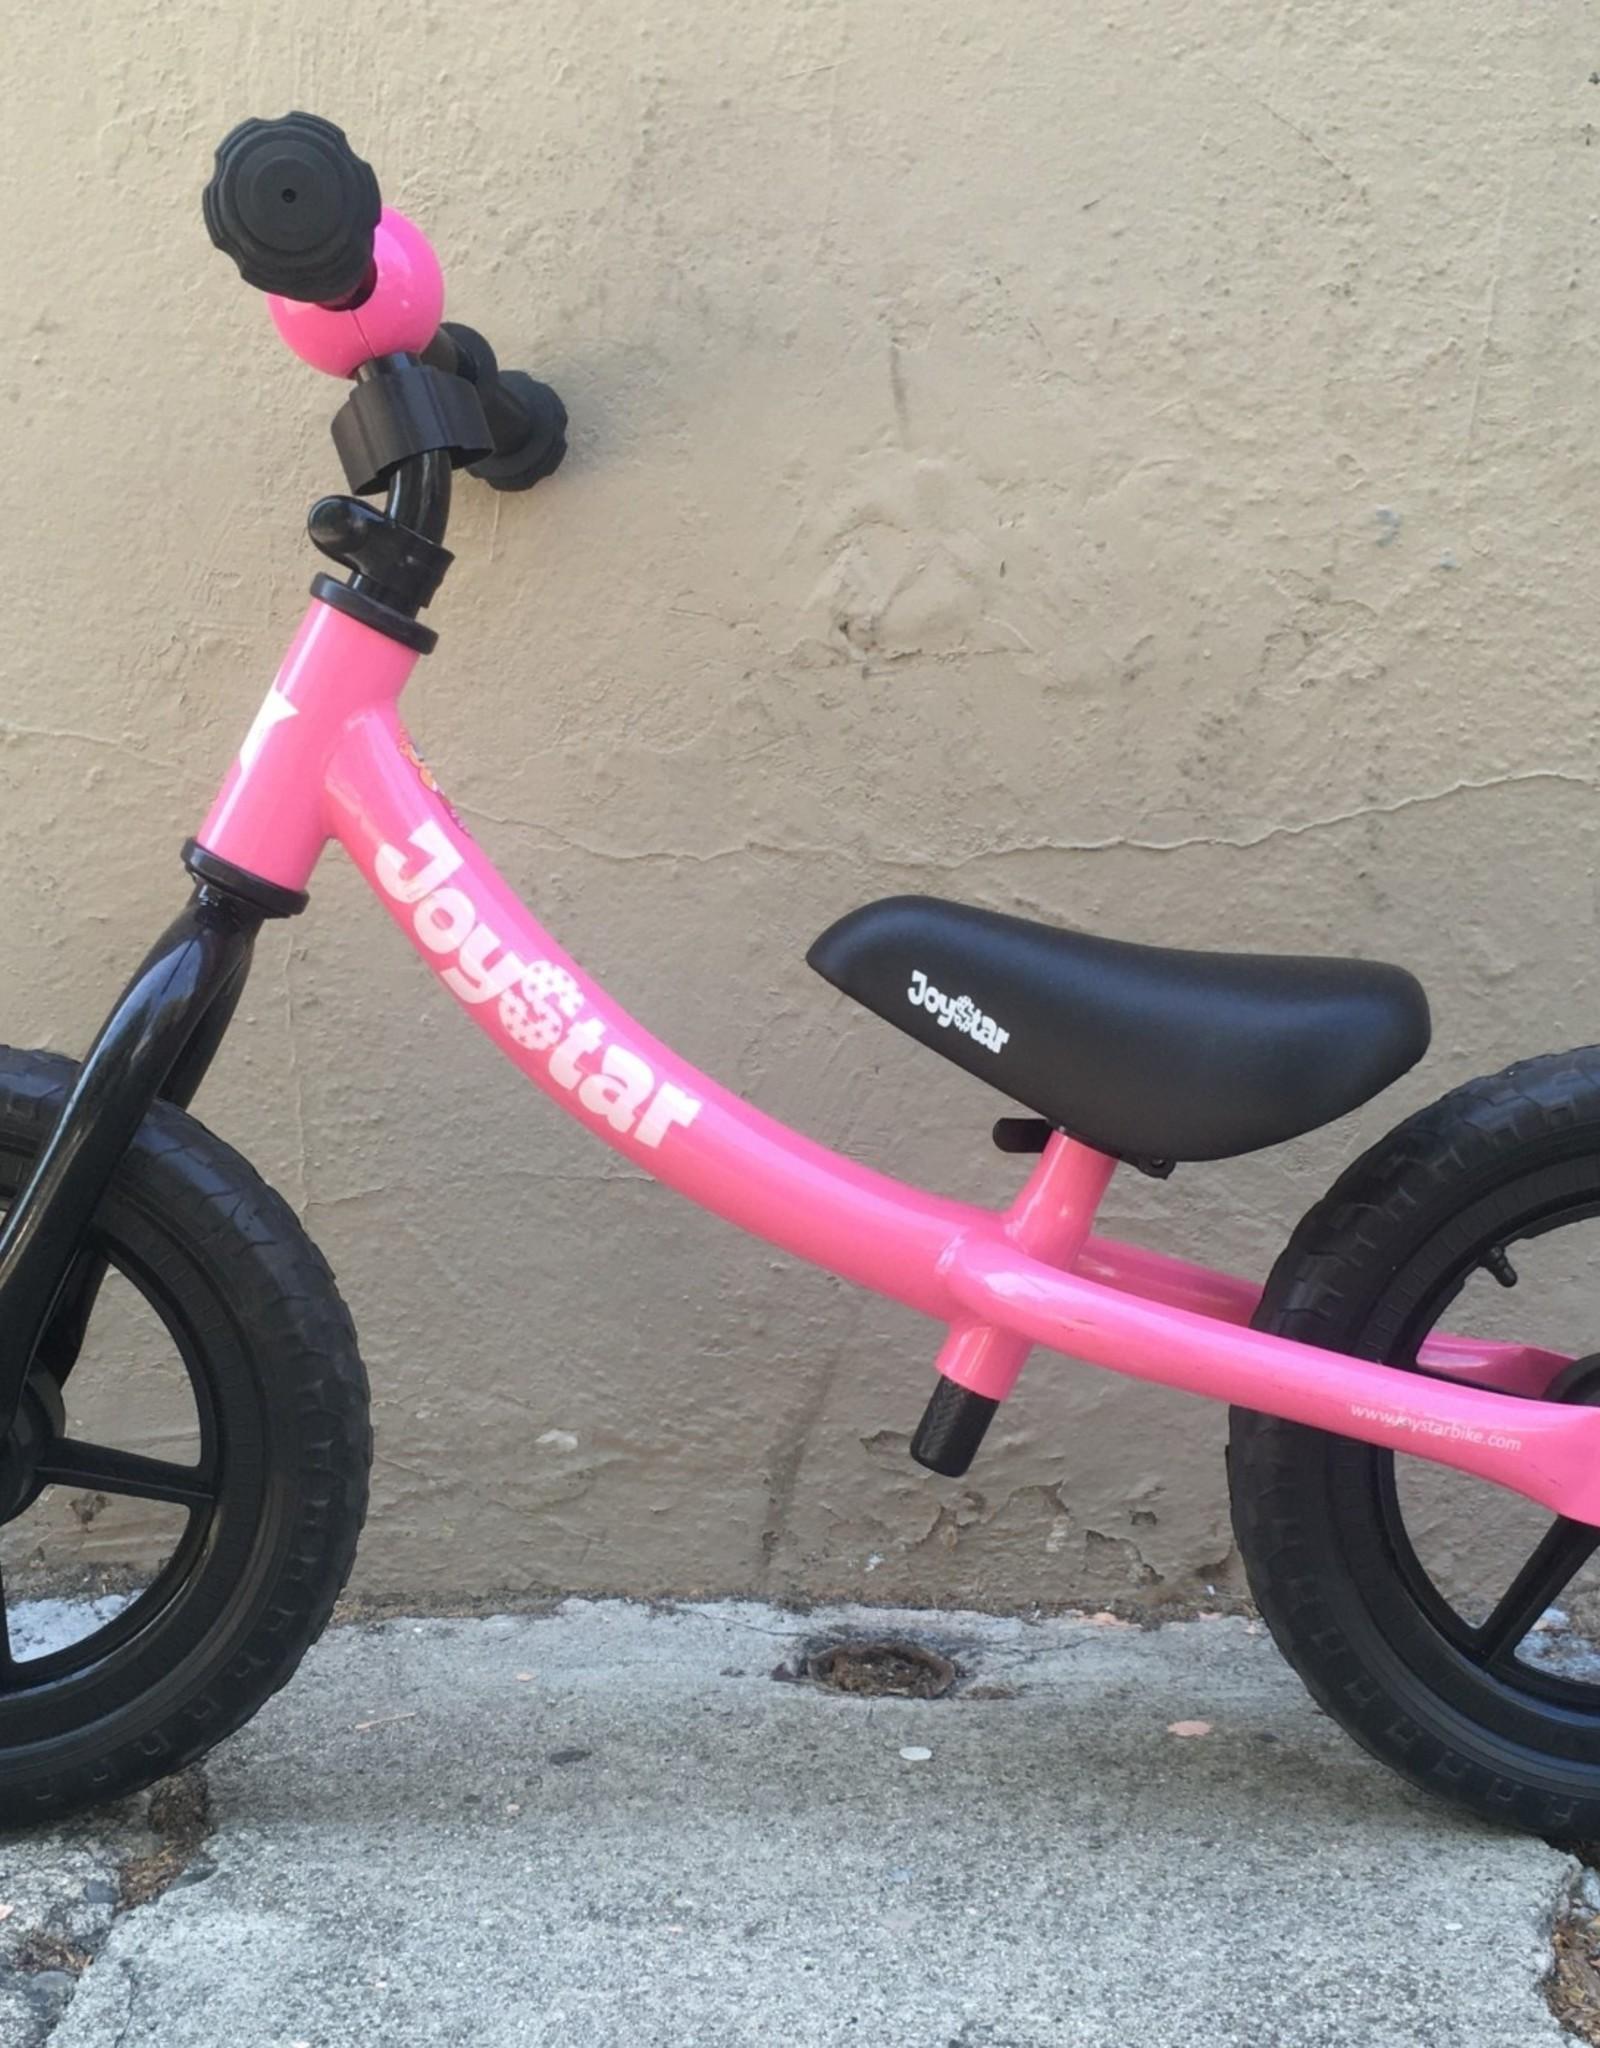 Joystar Joystar Balance Bike, 12 Inch wheels, Pink